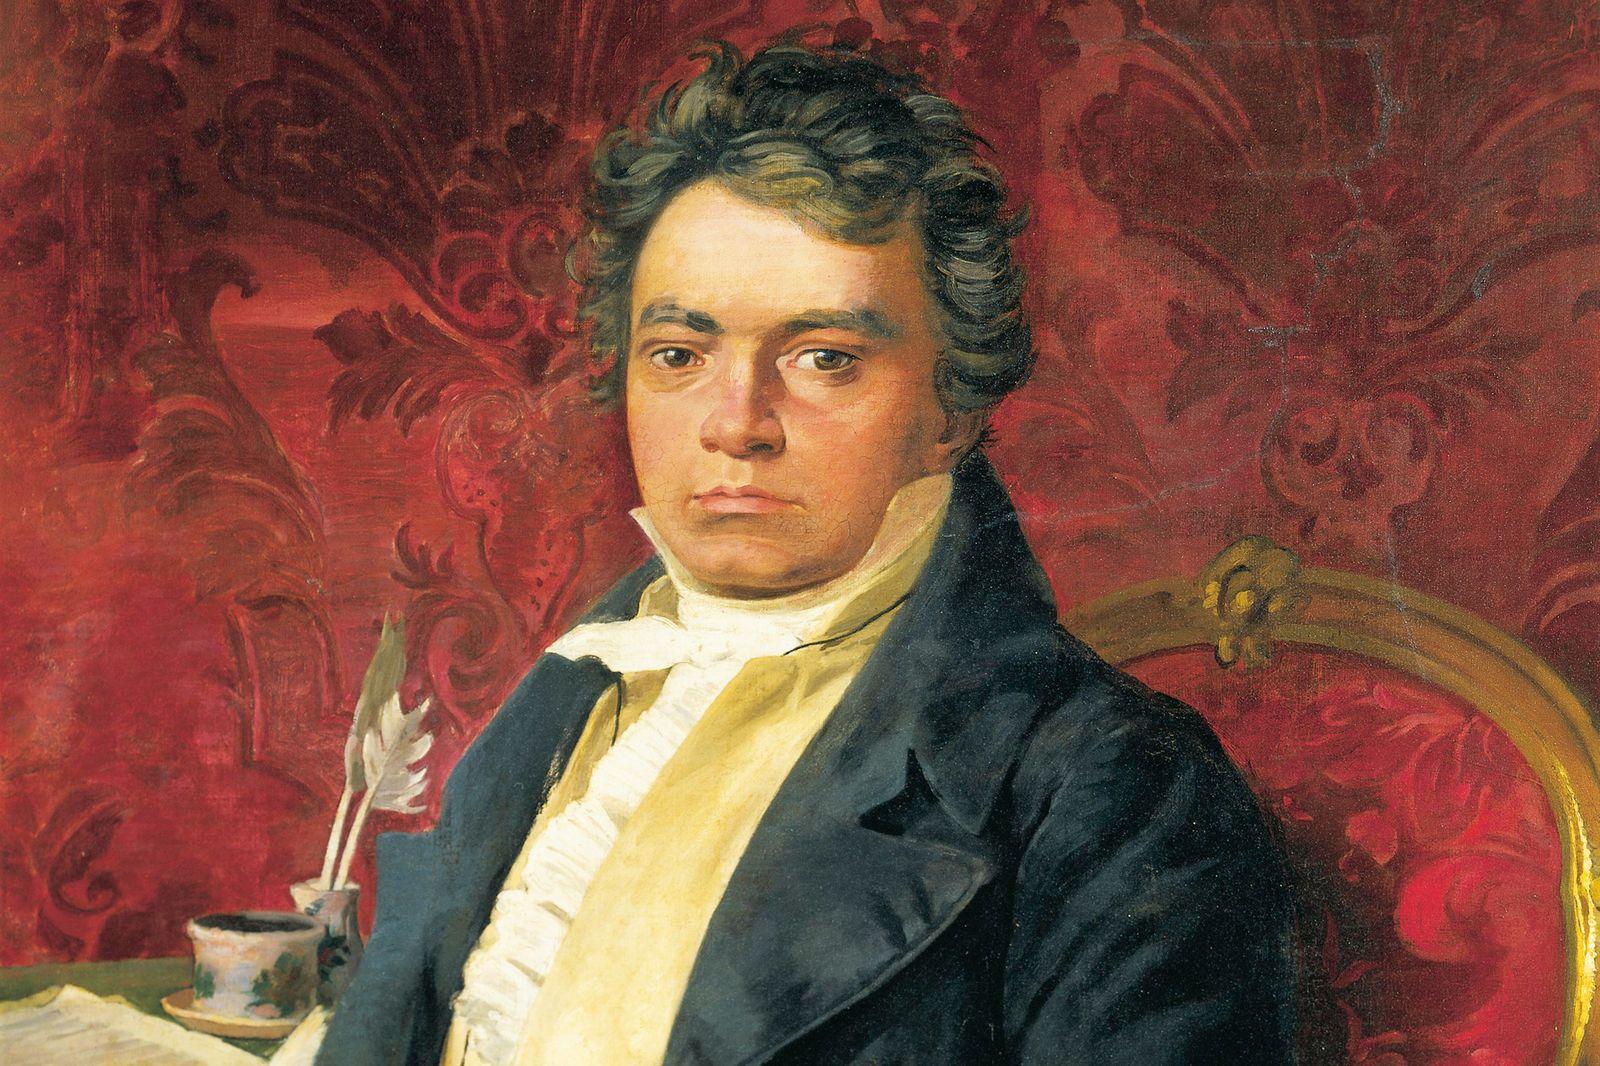 Germany, Portrait of German composer and pianist Ludwig van Beethoven